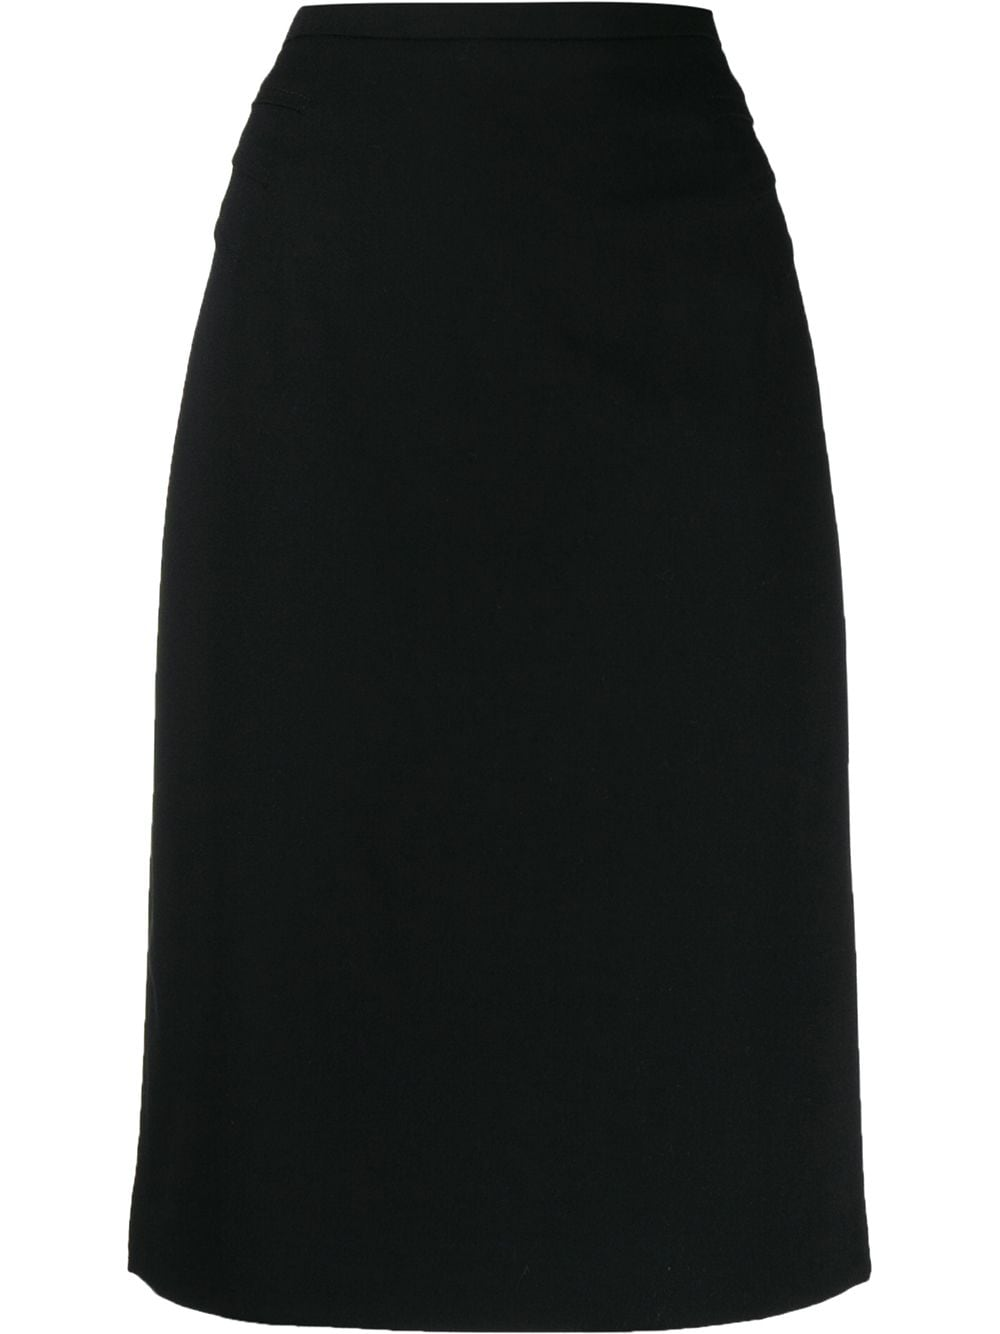 Emporio Armani юбка-карандаш с завышенной талией